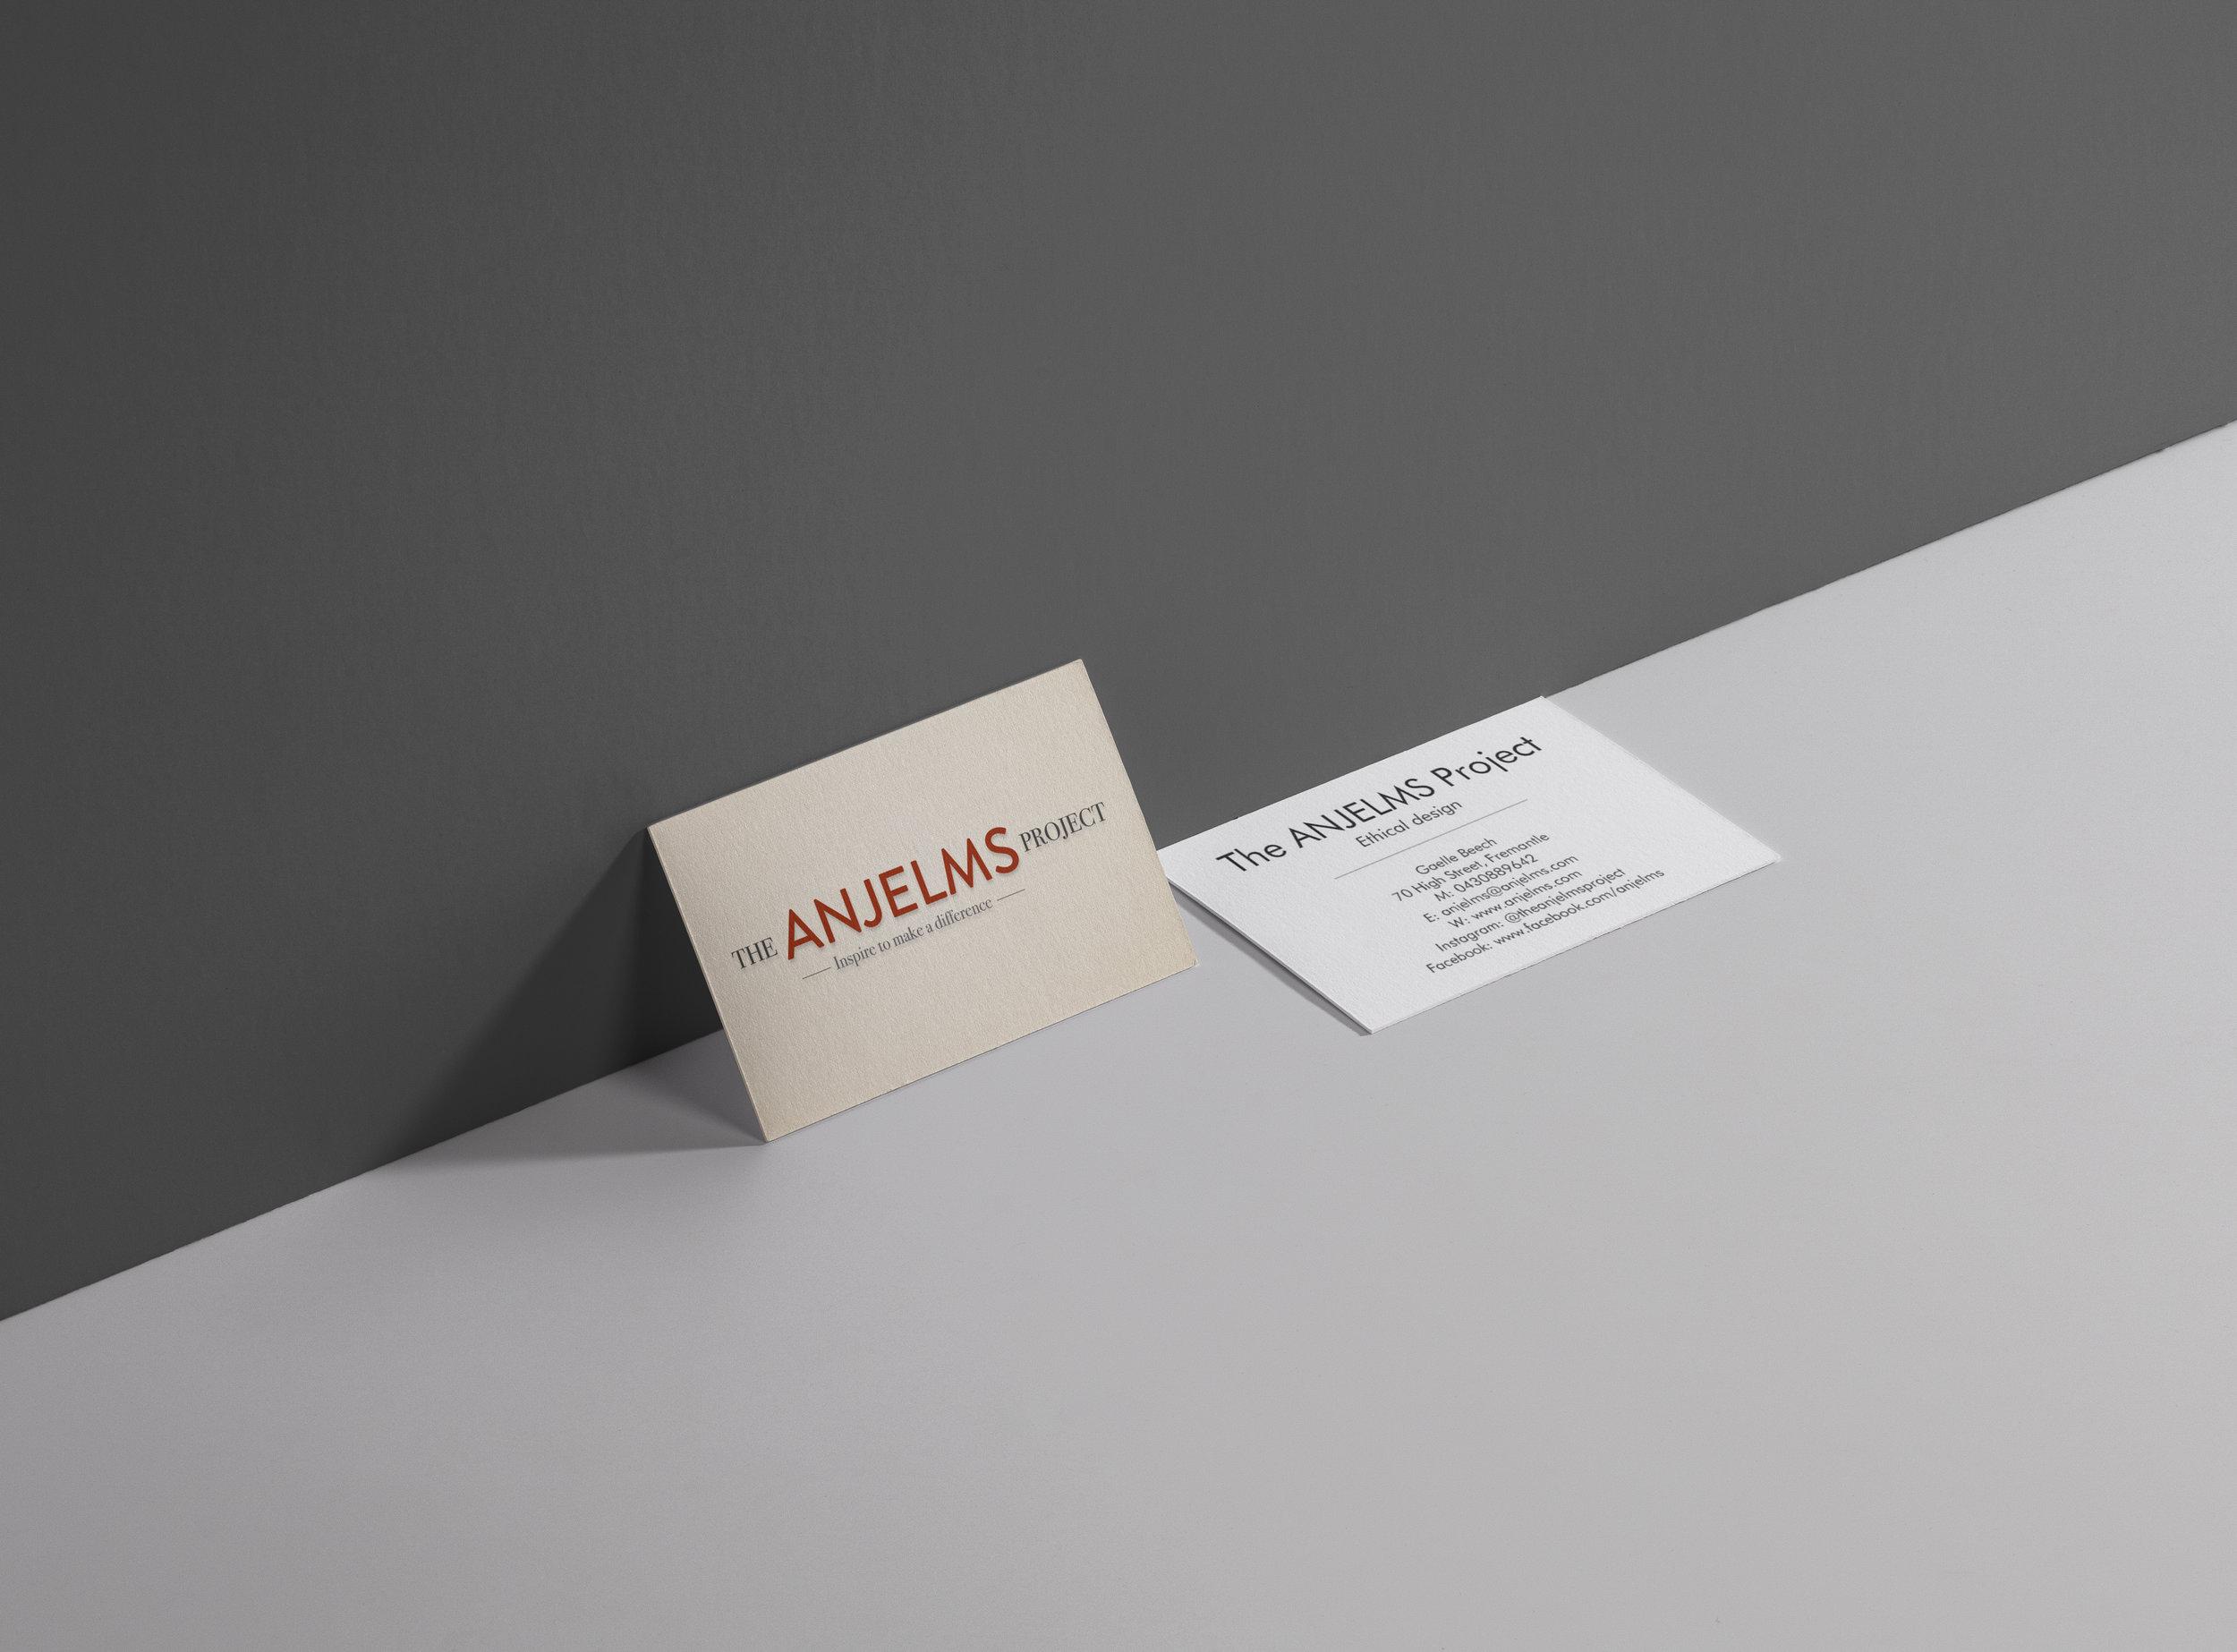 anjelms business card.jpg